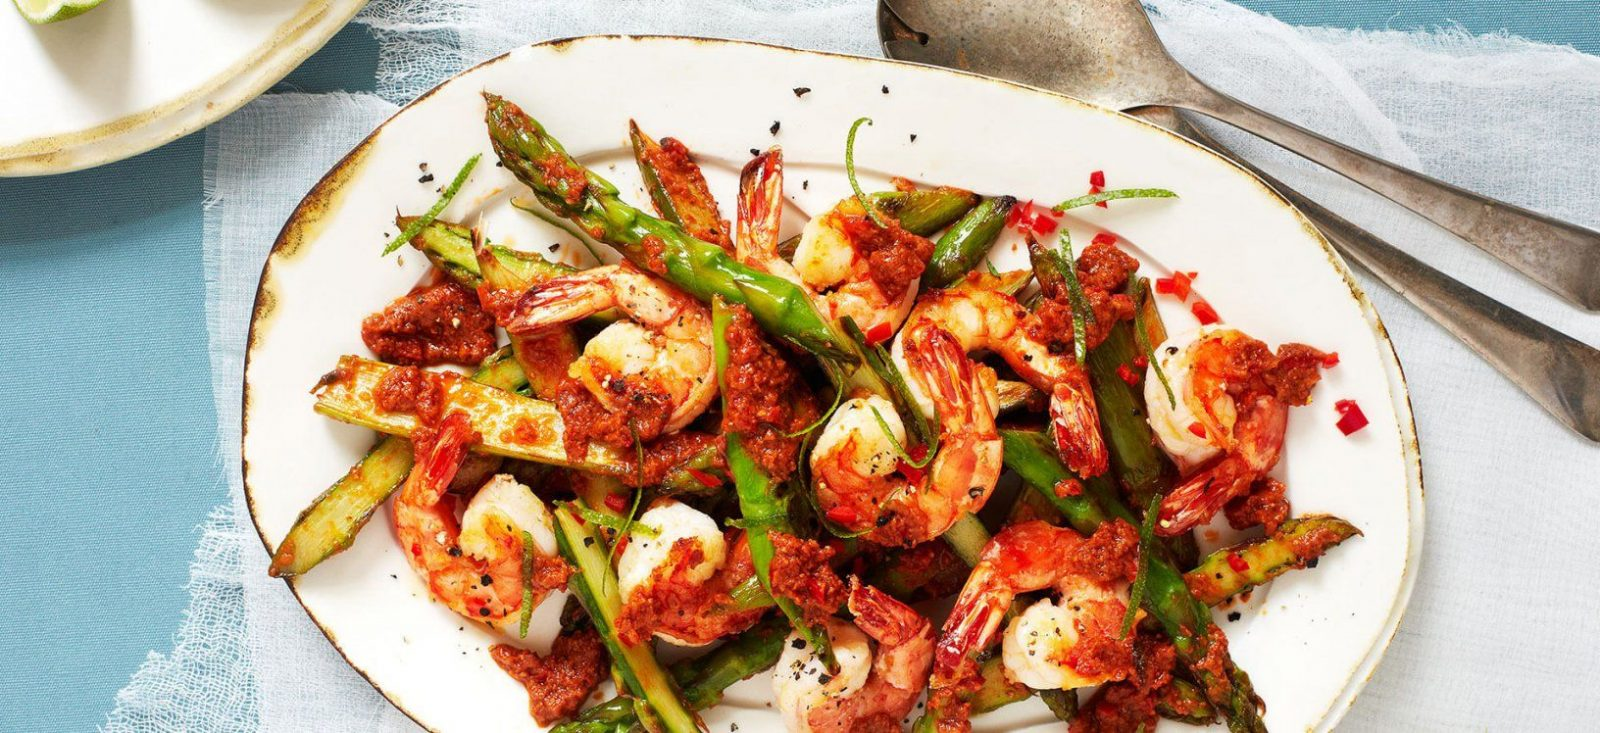 Italienische Rezepte  Bertolli Italienische Kche Rezepte von Italienische Kochrezepte Mit Bildern Bild